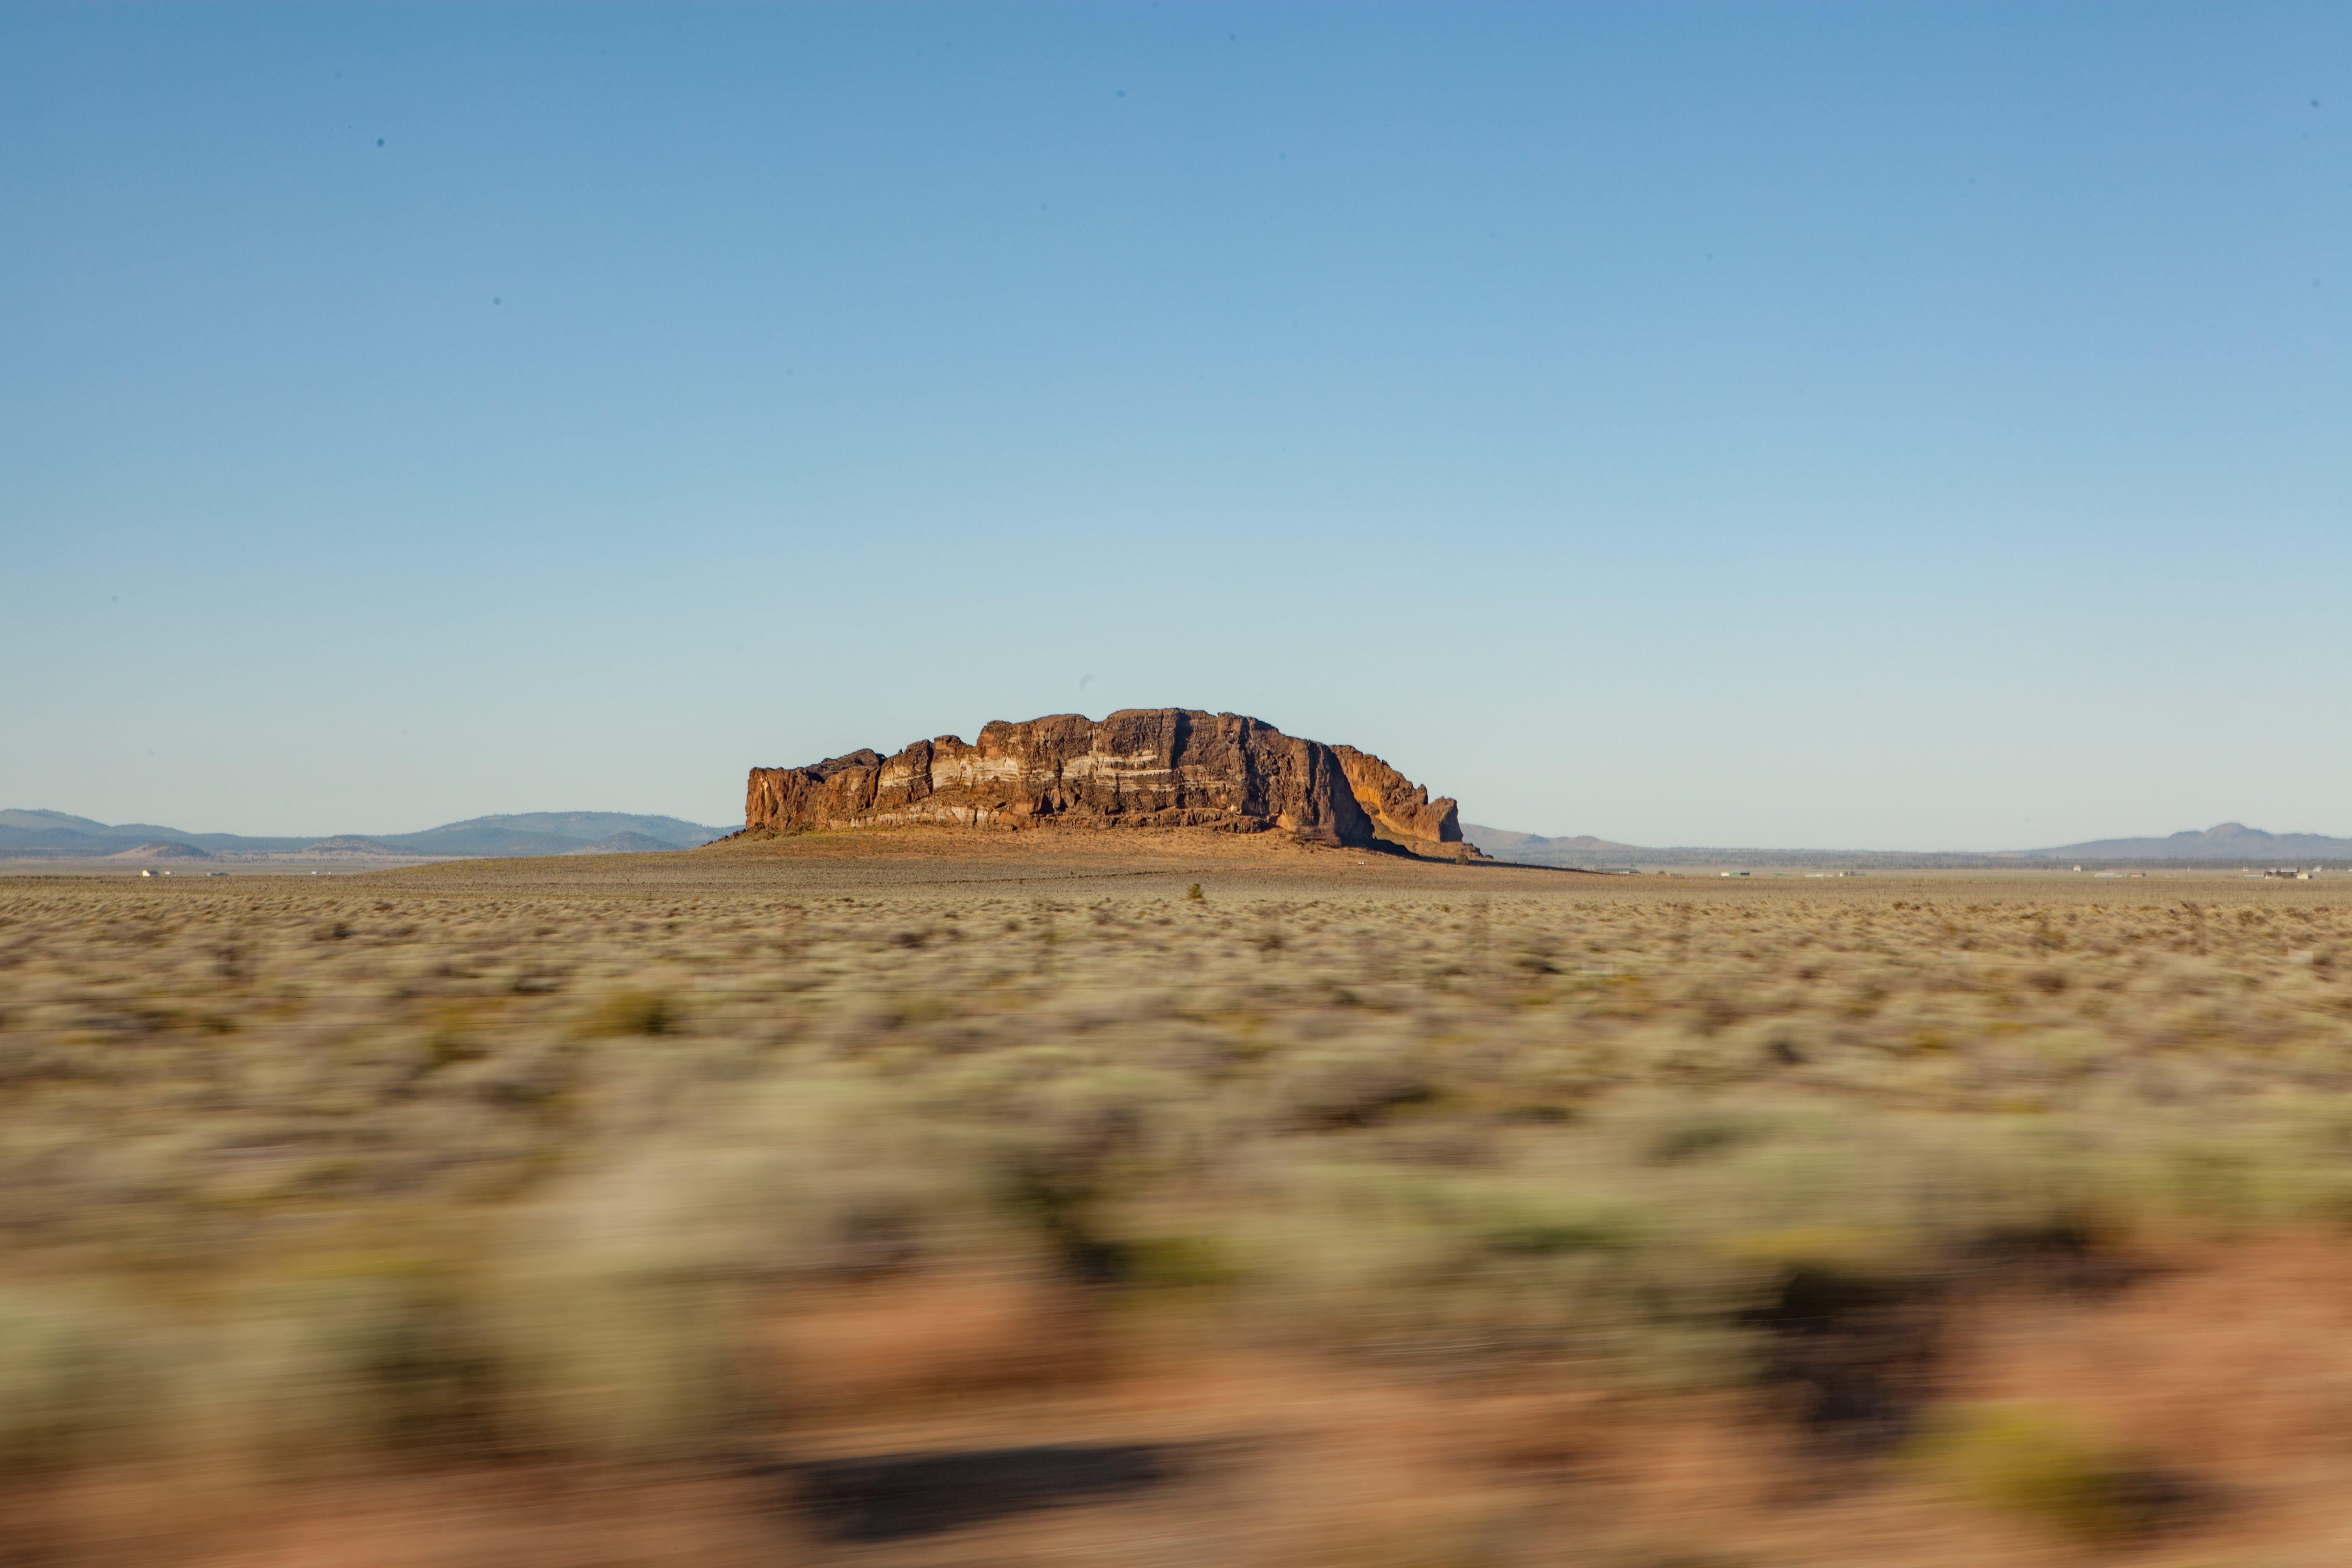 Free stock photo of cowboy, desert, fort rock, landscape